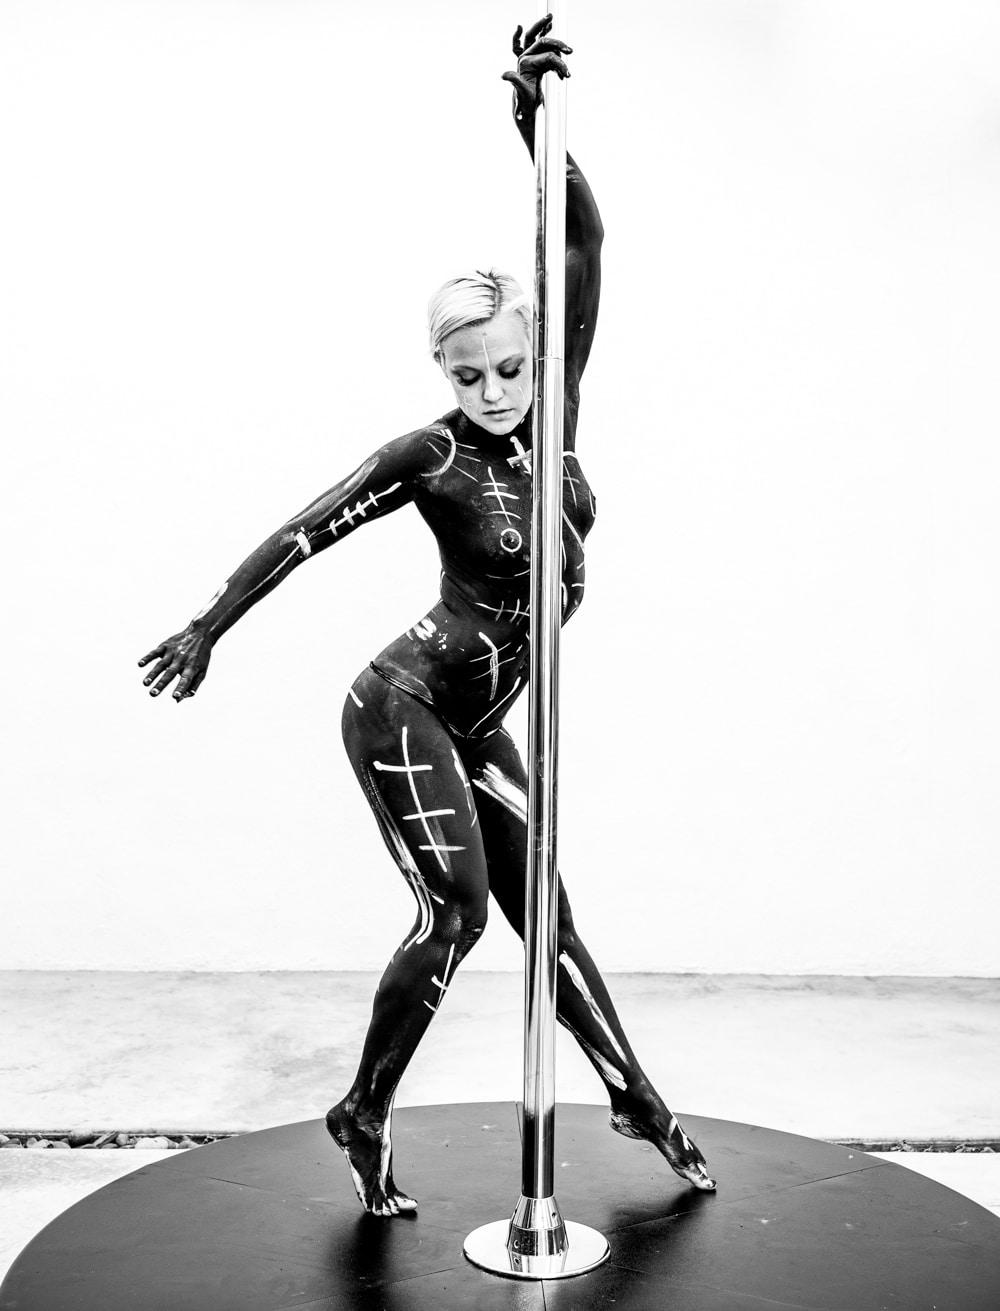 pole_dance_ancient_lines_beylerian_2